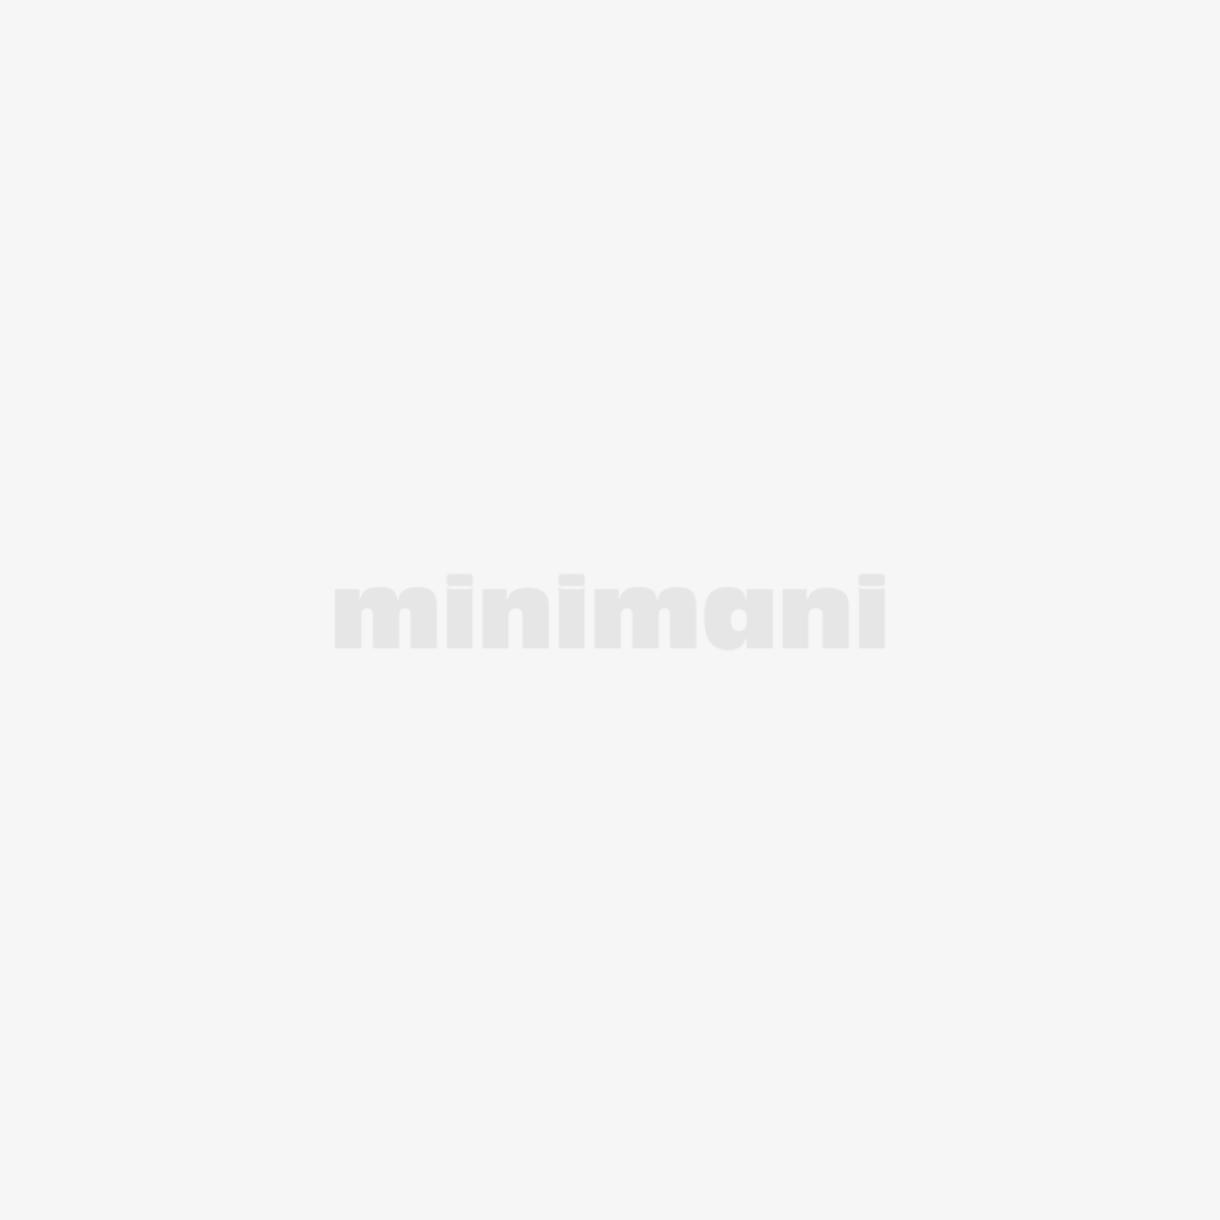 NIKKO CAMO CLASS FORD F-150 SVT